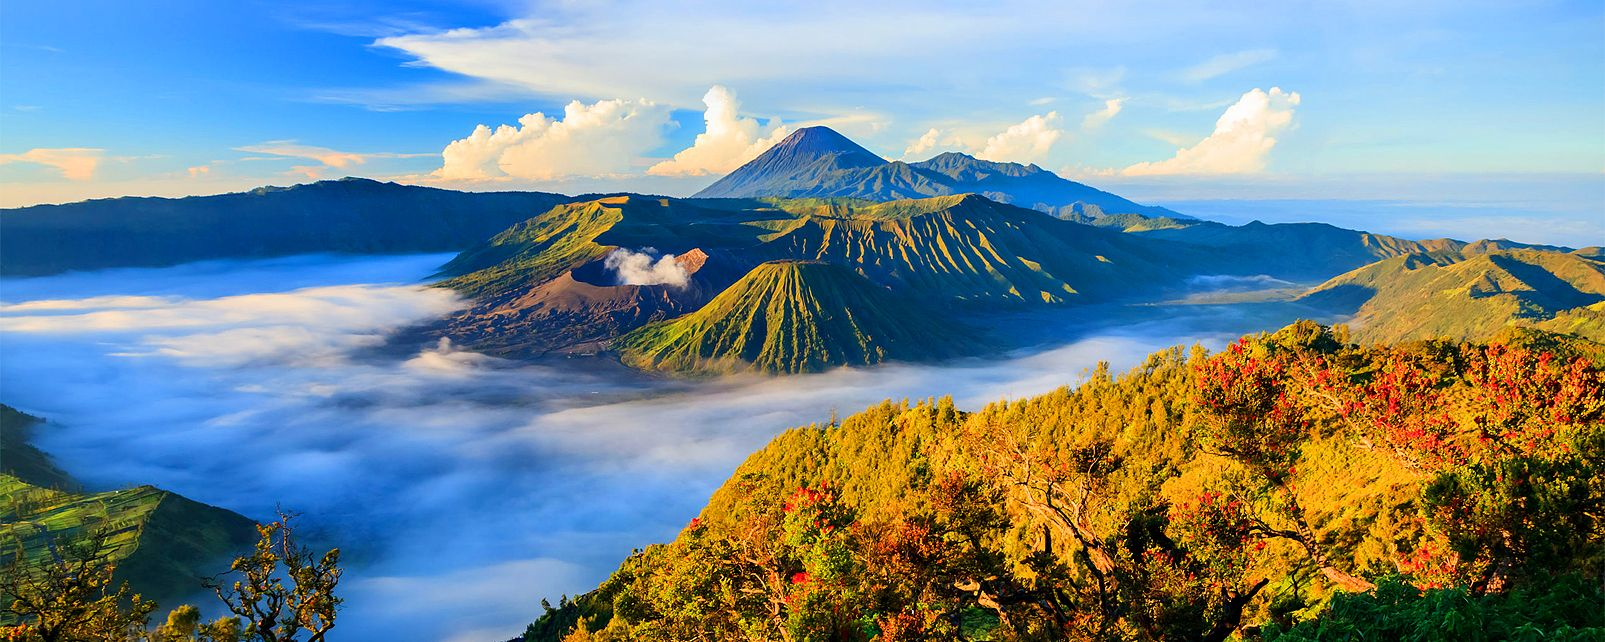 Le volcan Bromo , Indonésie